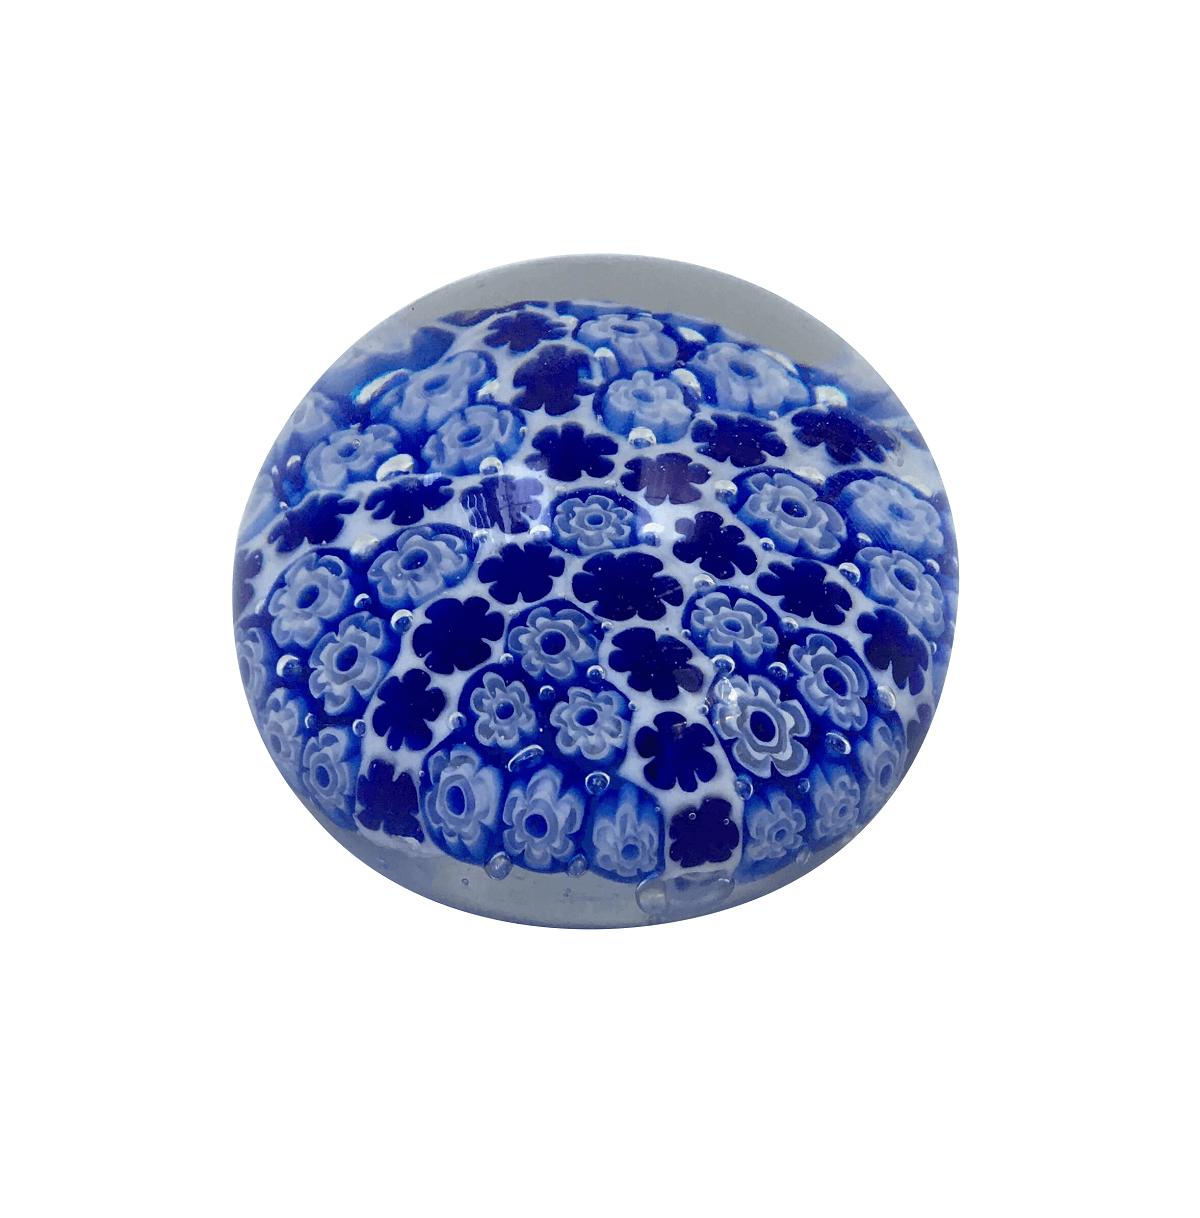 Peso De Murano Bola Flores Azul